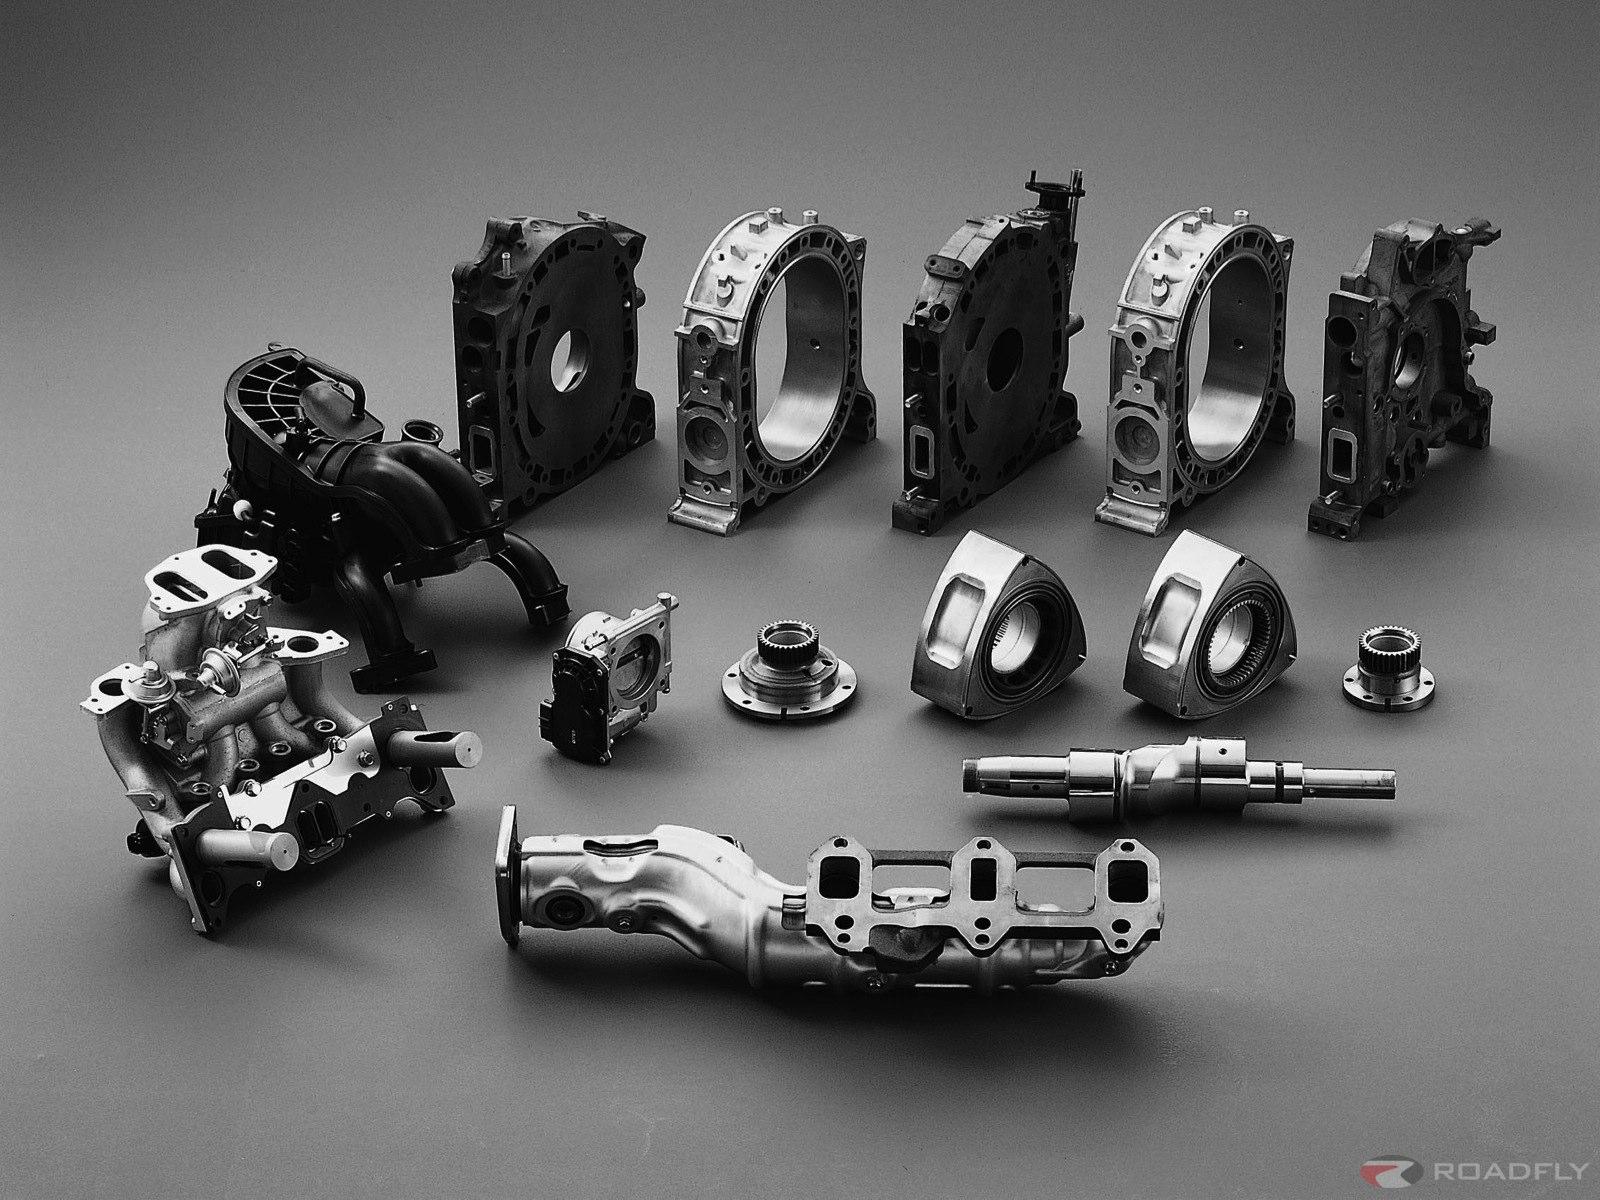 [Image: rotary-engine-parts.jpg]